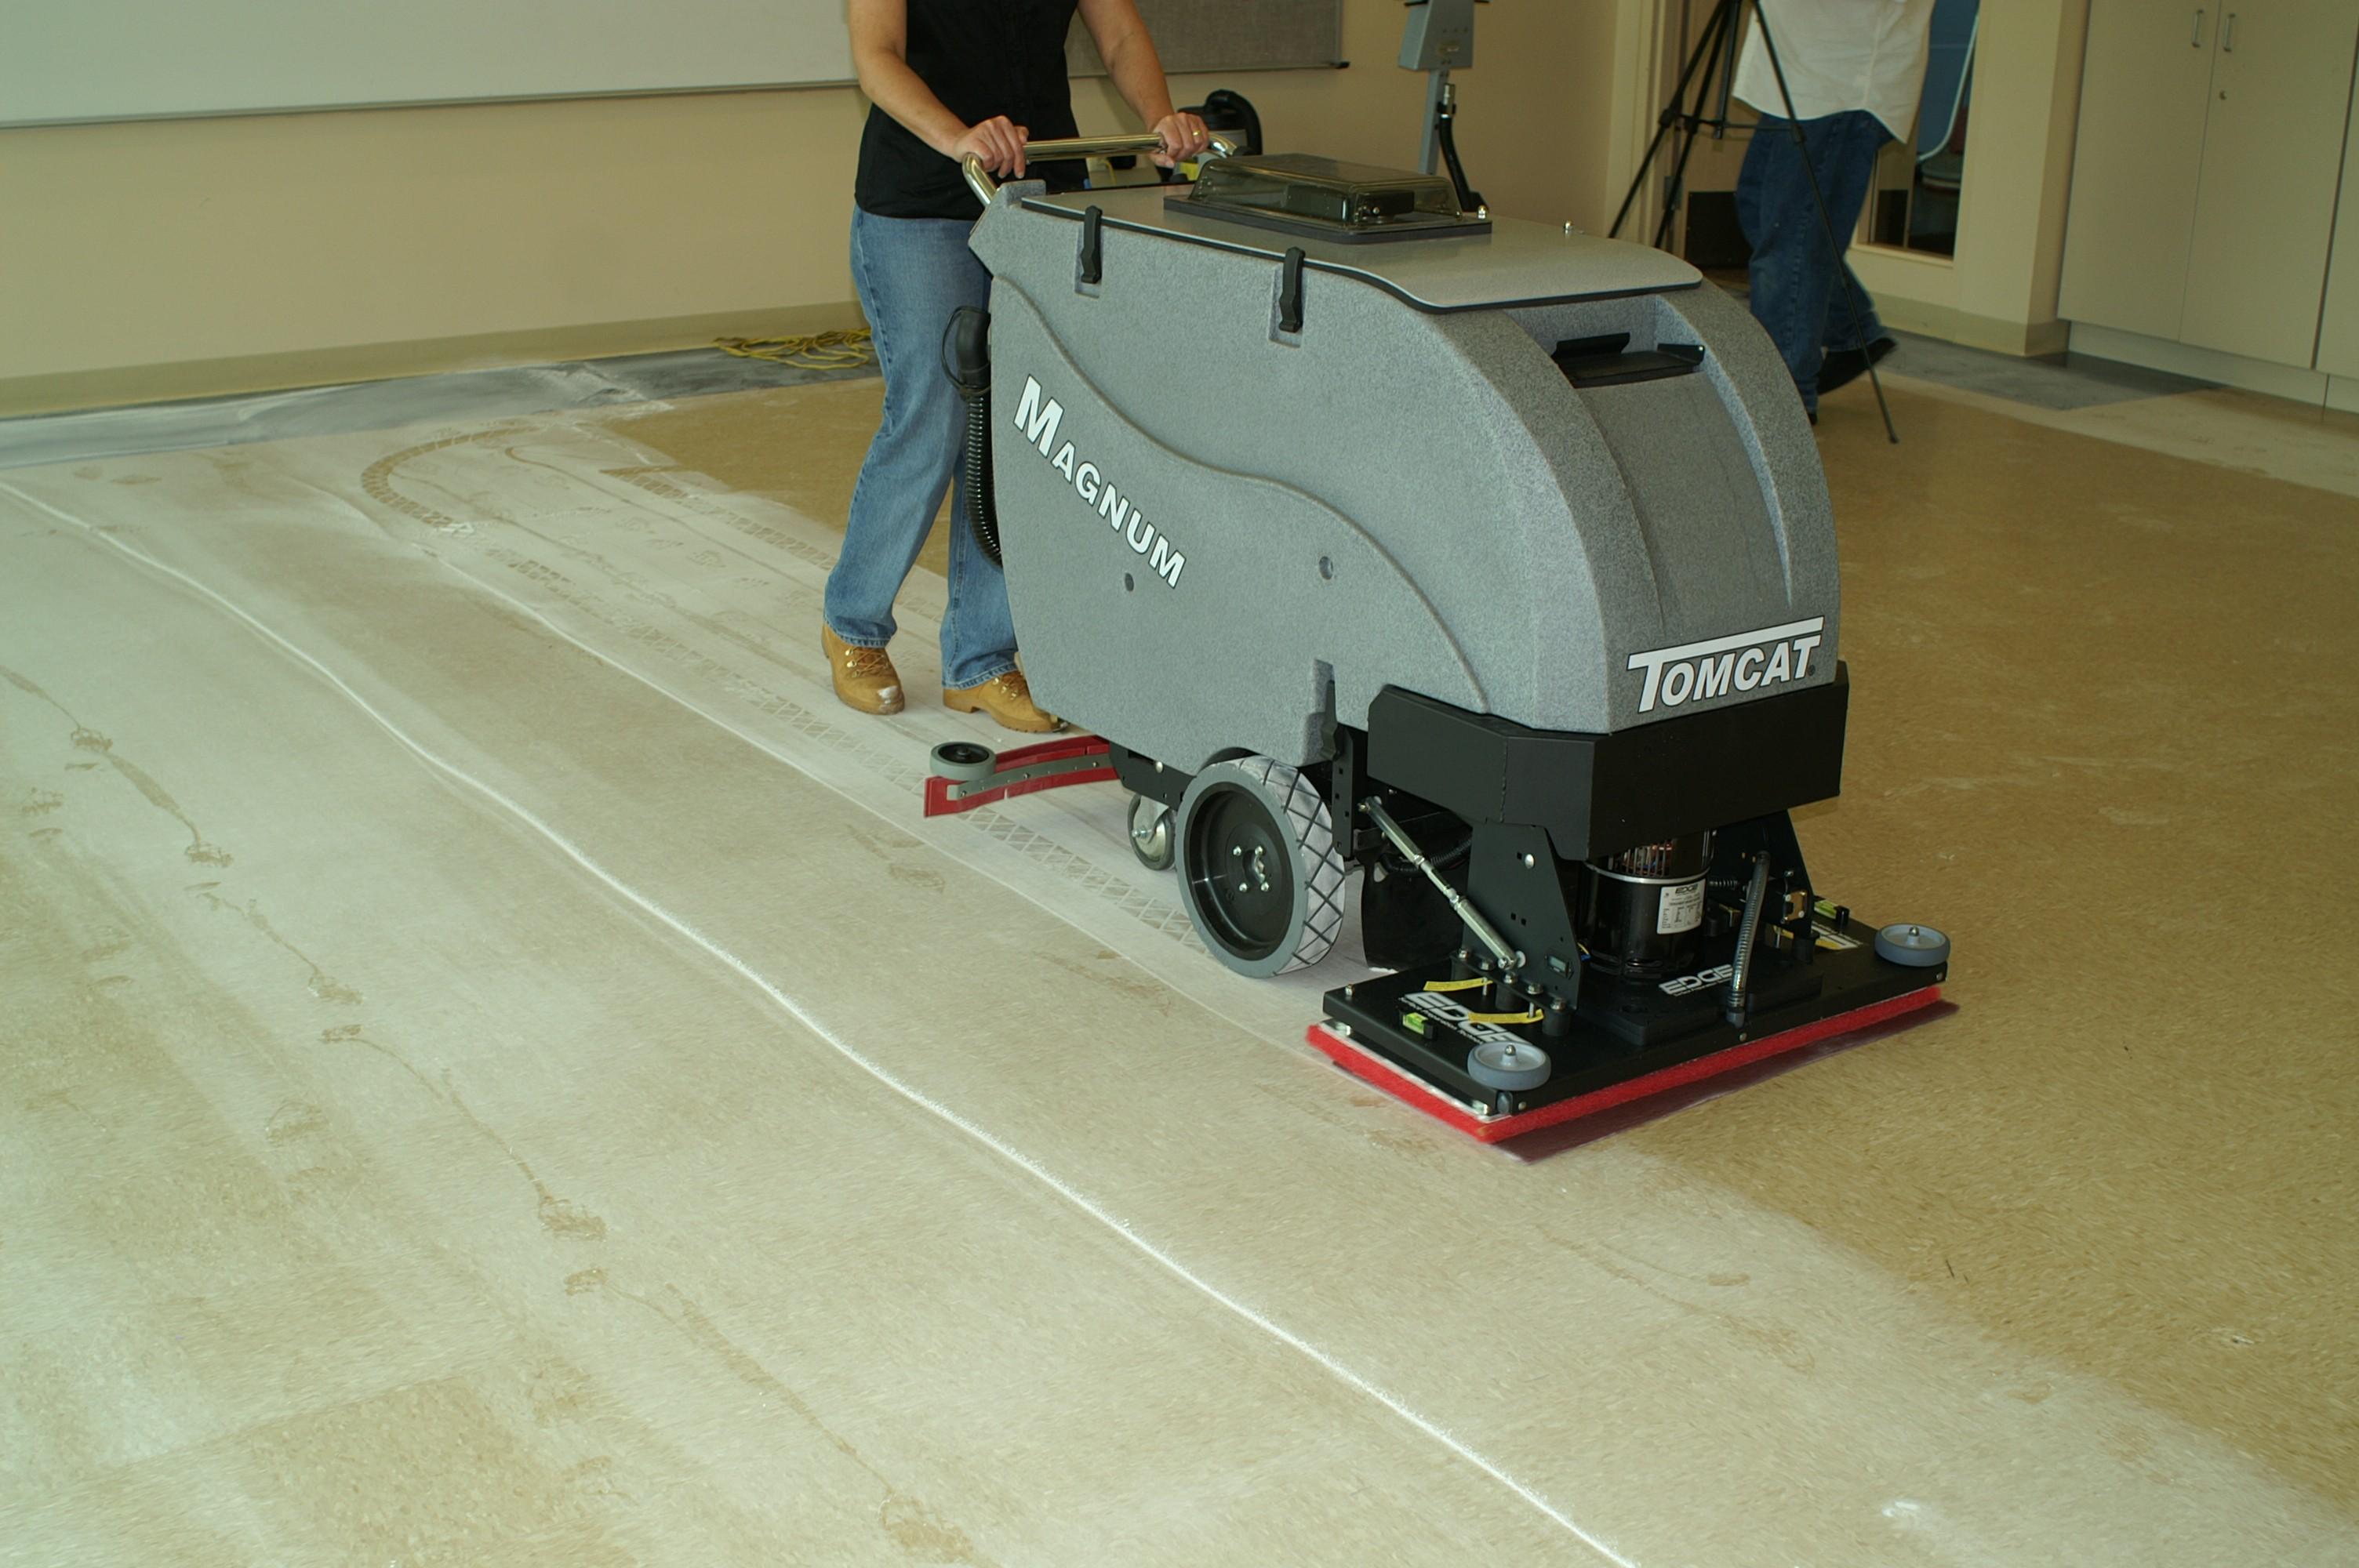 floor washing scrubber design ride carpet tomcat on scrubbers floors brilliant karcher machines flooring ideas cleaning